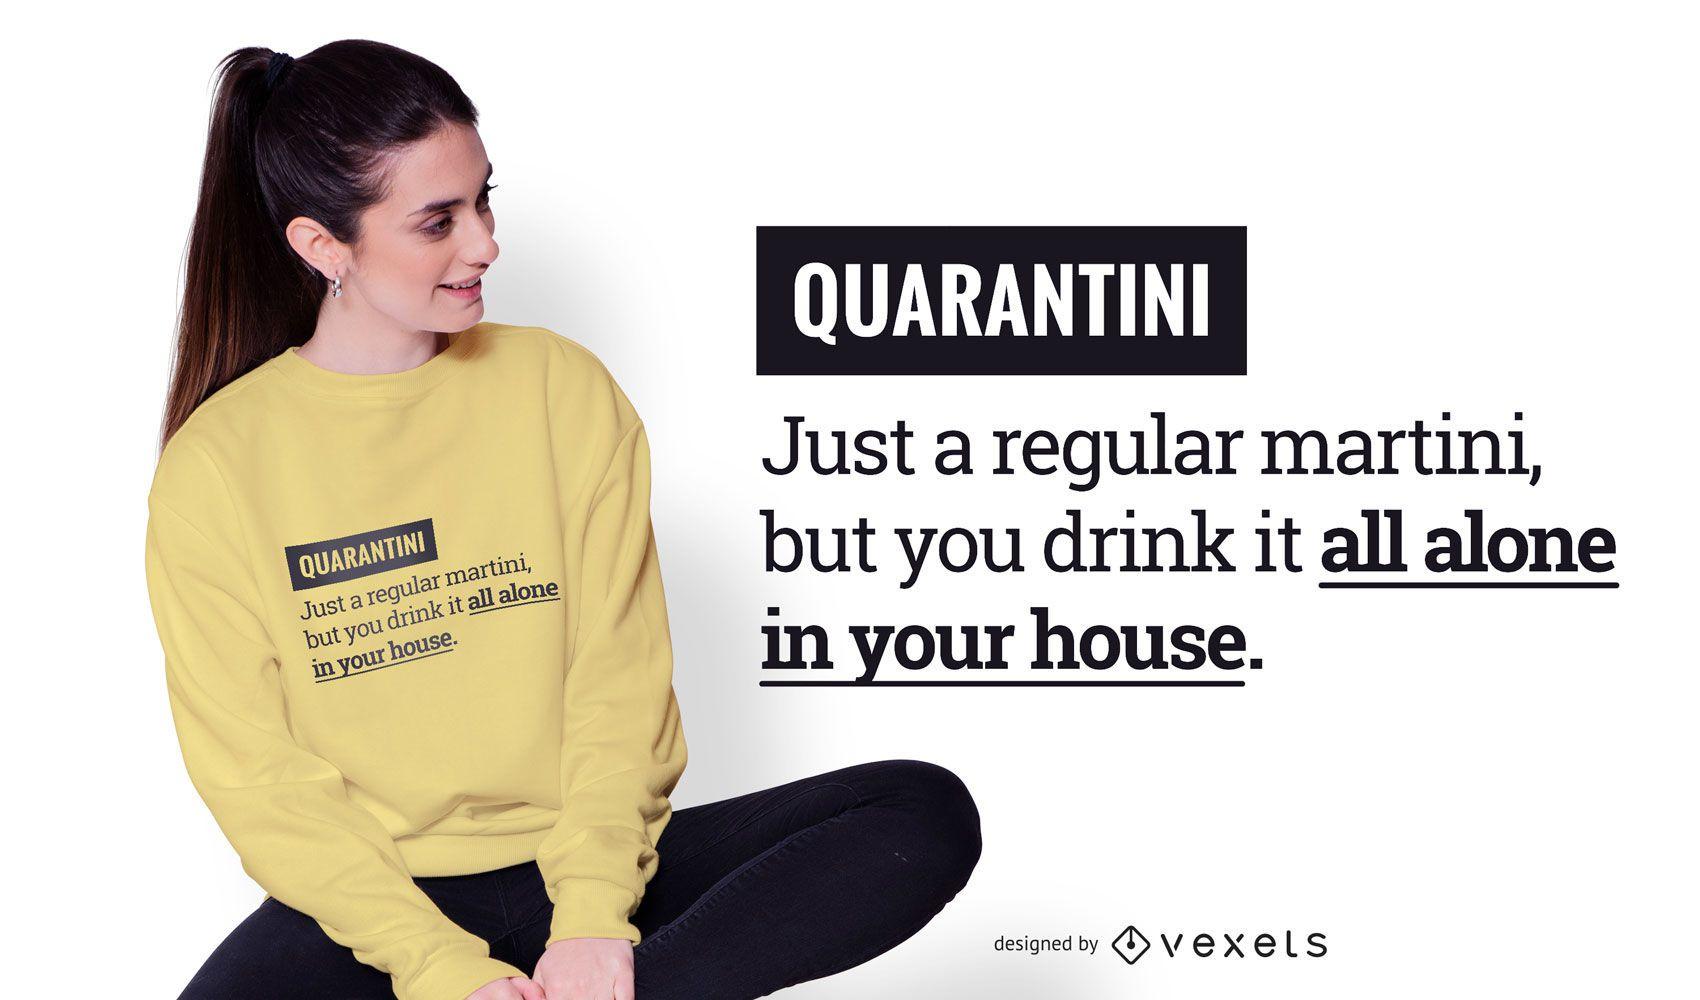 Quarantine Funny Text T-shirt Design